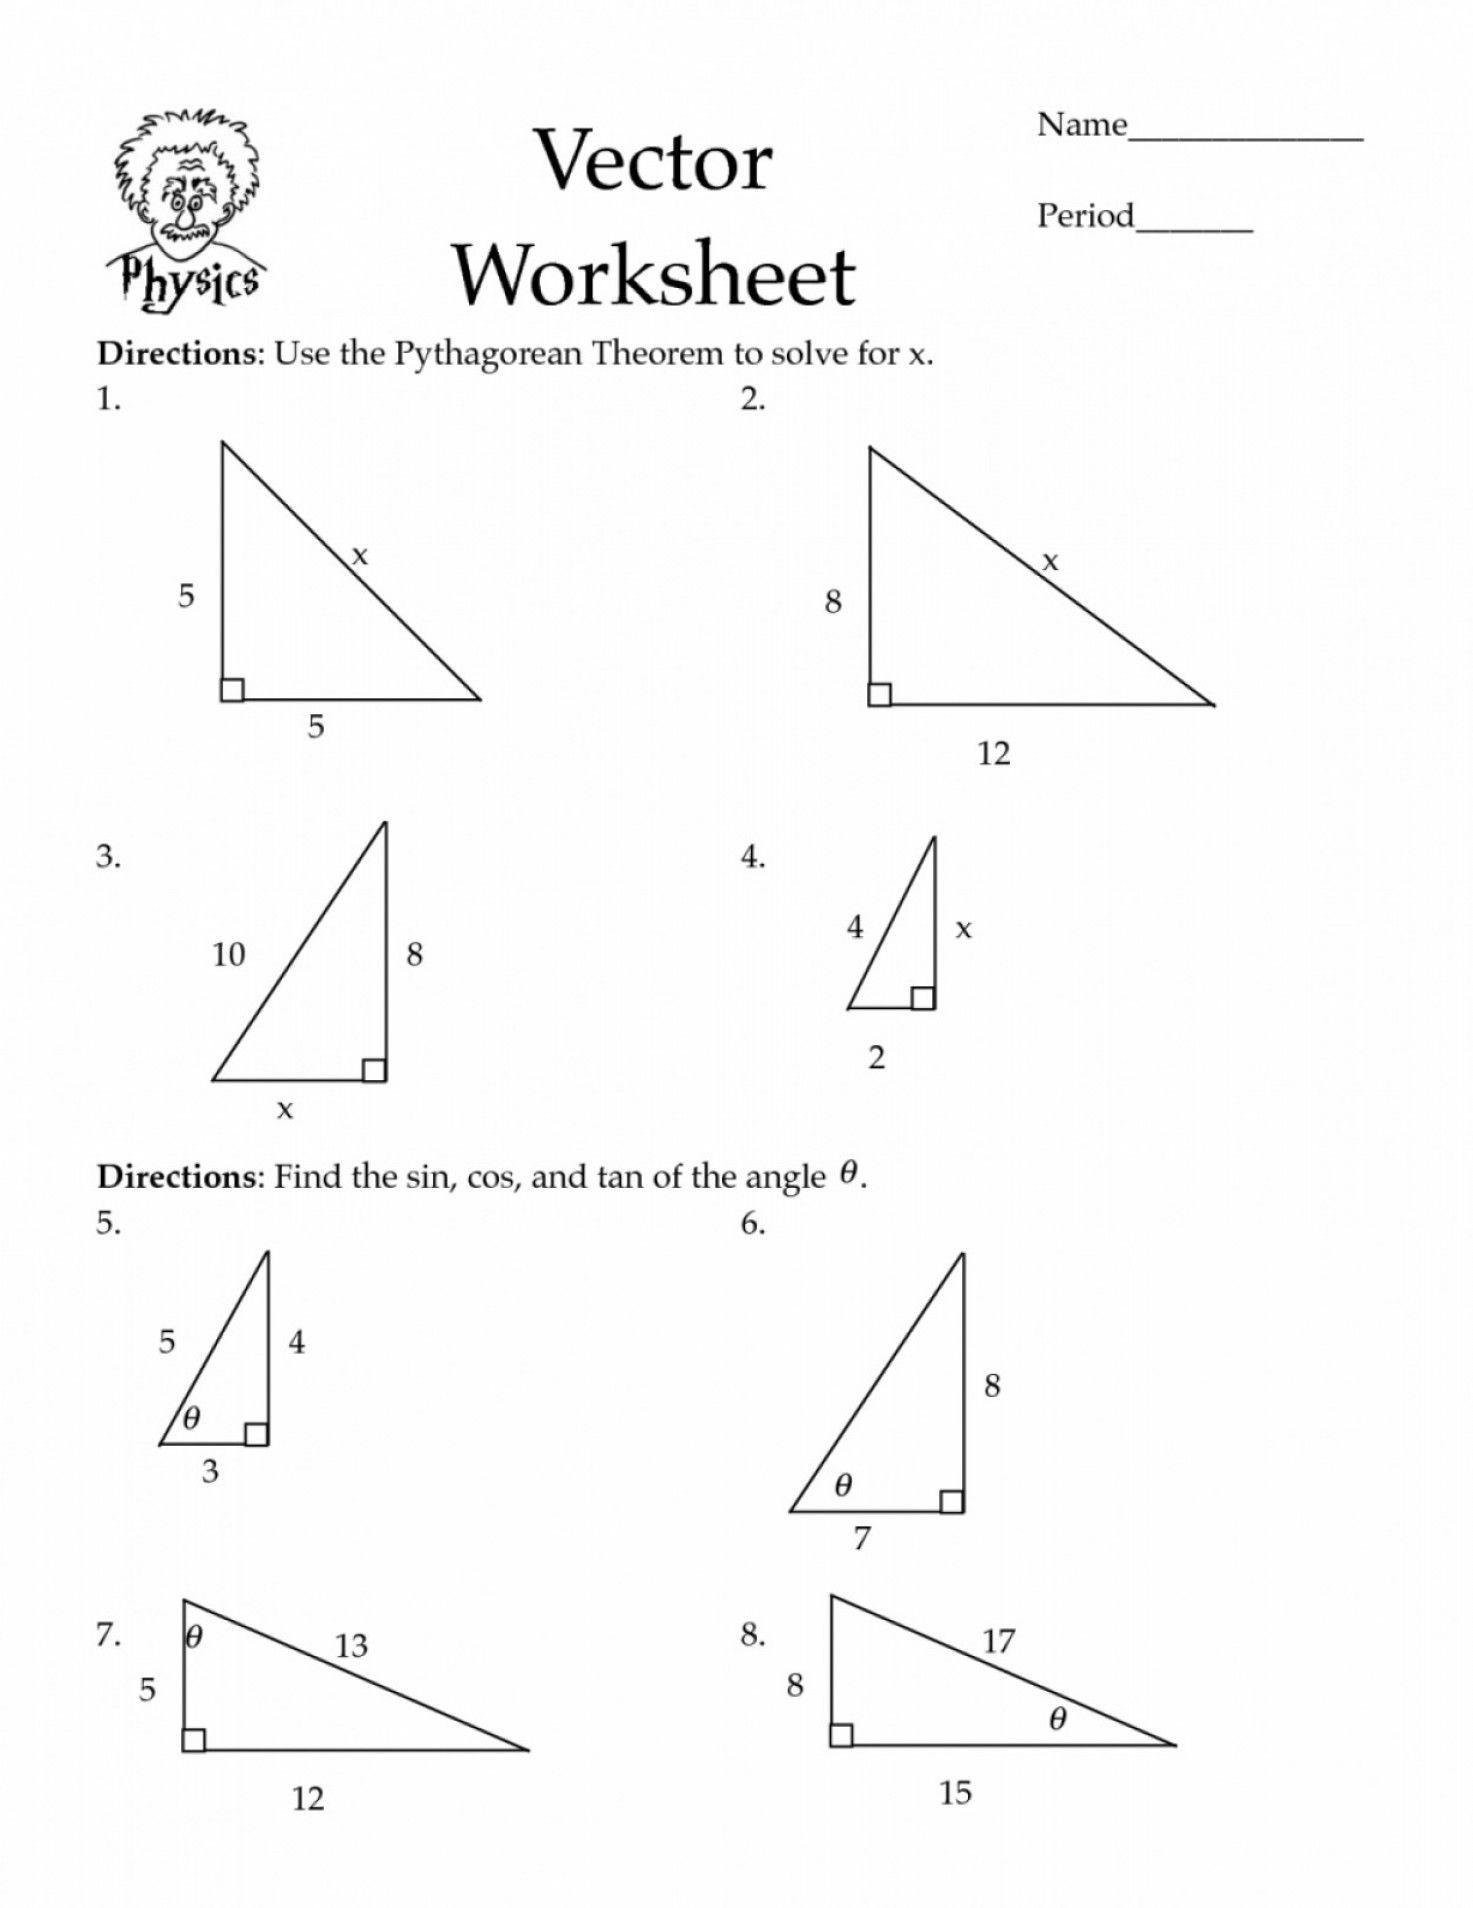 Pythagorean theorem Practice Worksheet 40 Innovative Pythagorean theorem Worksheet for You